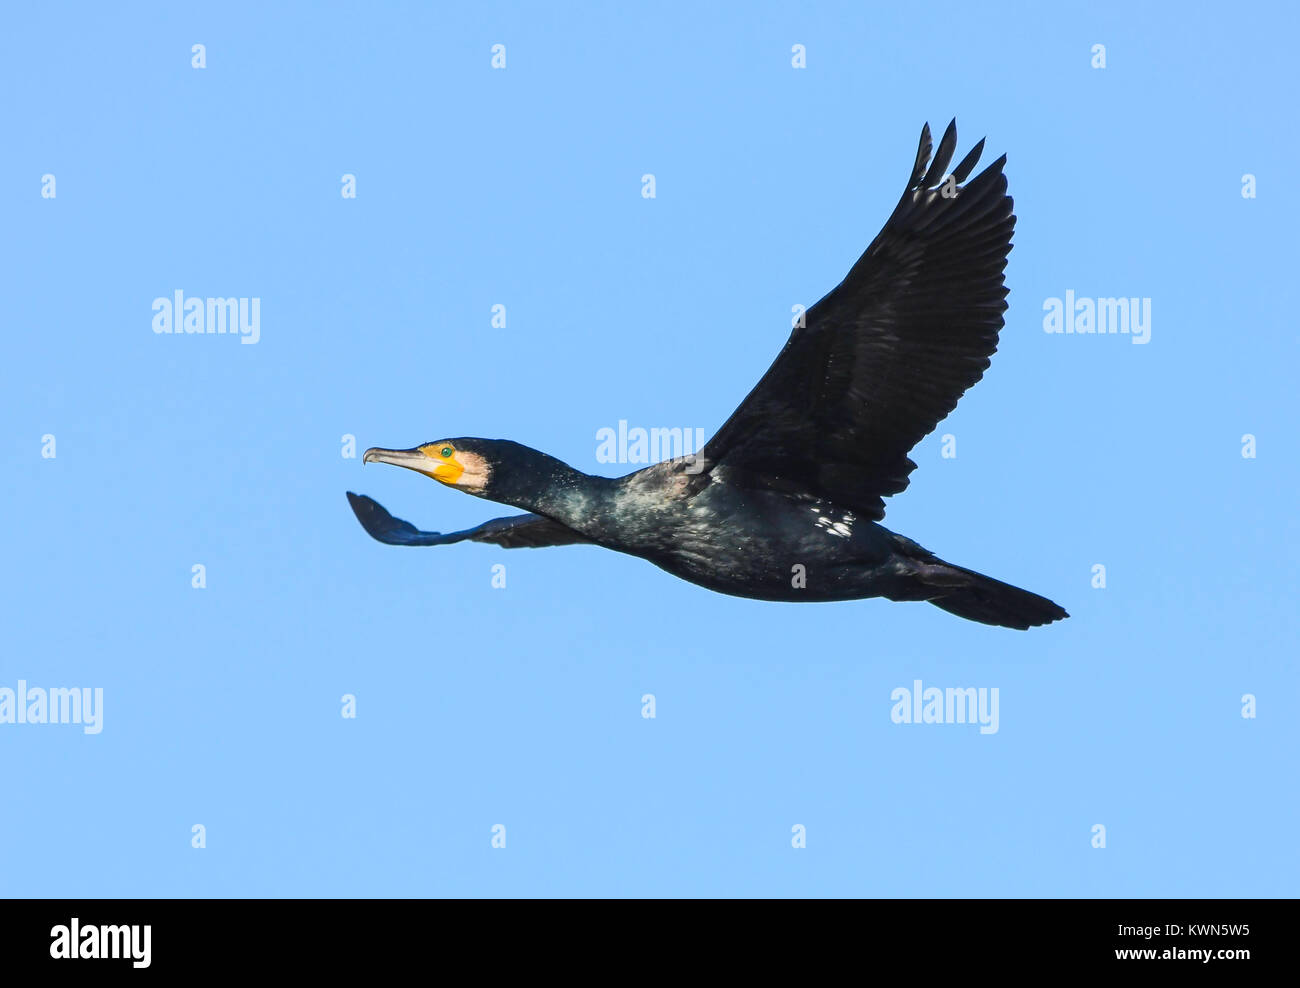 Cormorant in flight - Stock Image